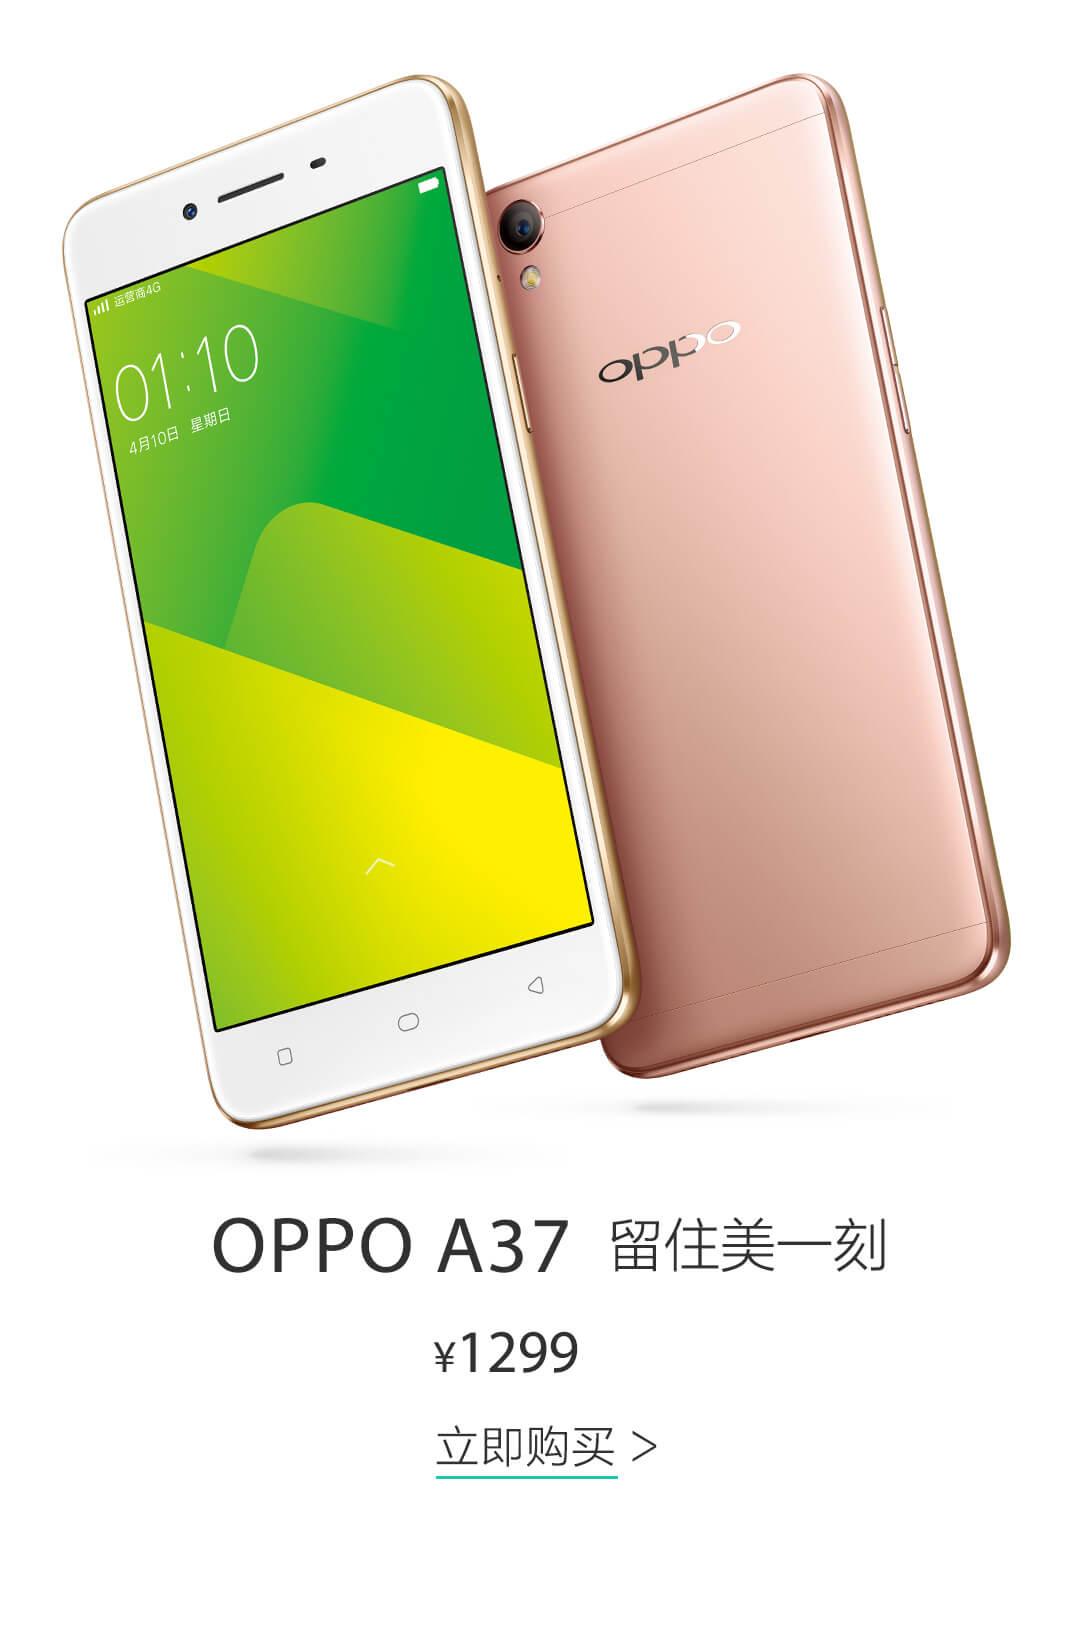 OPPO A37